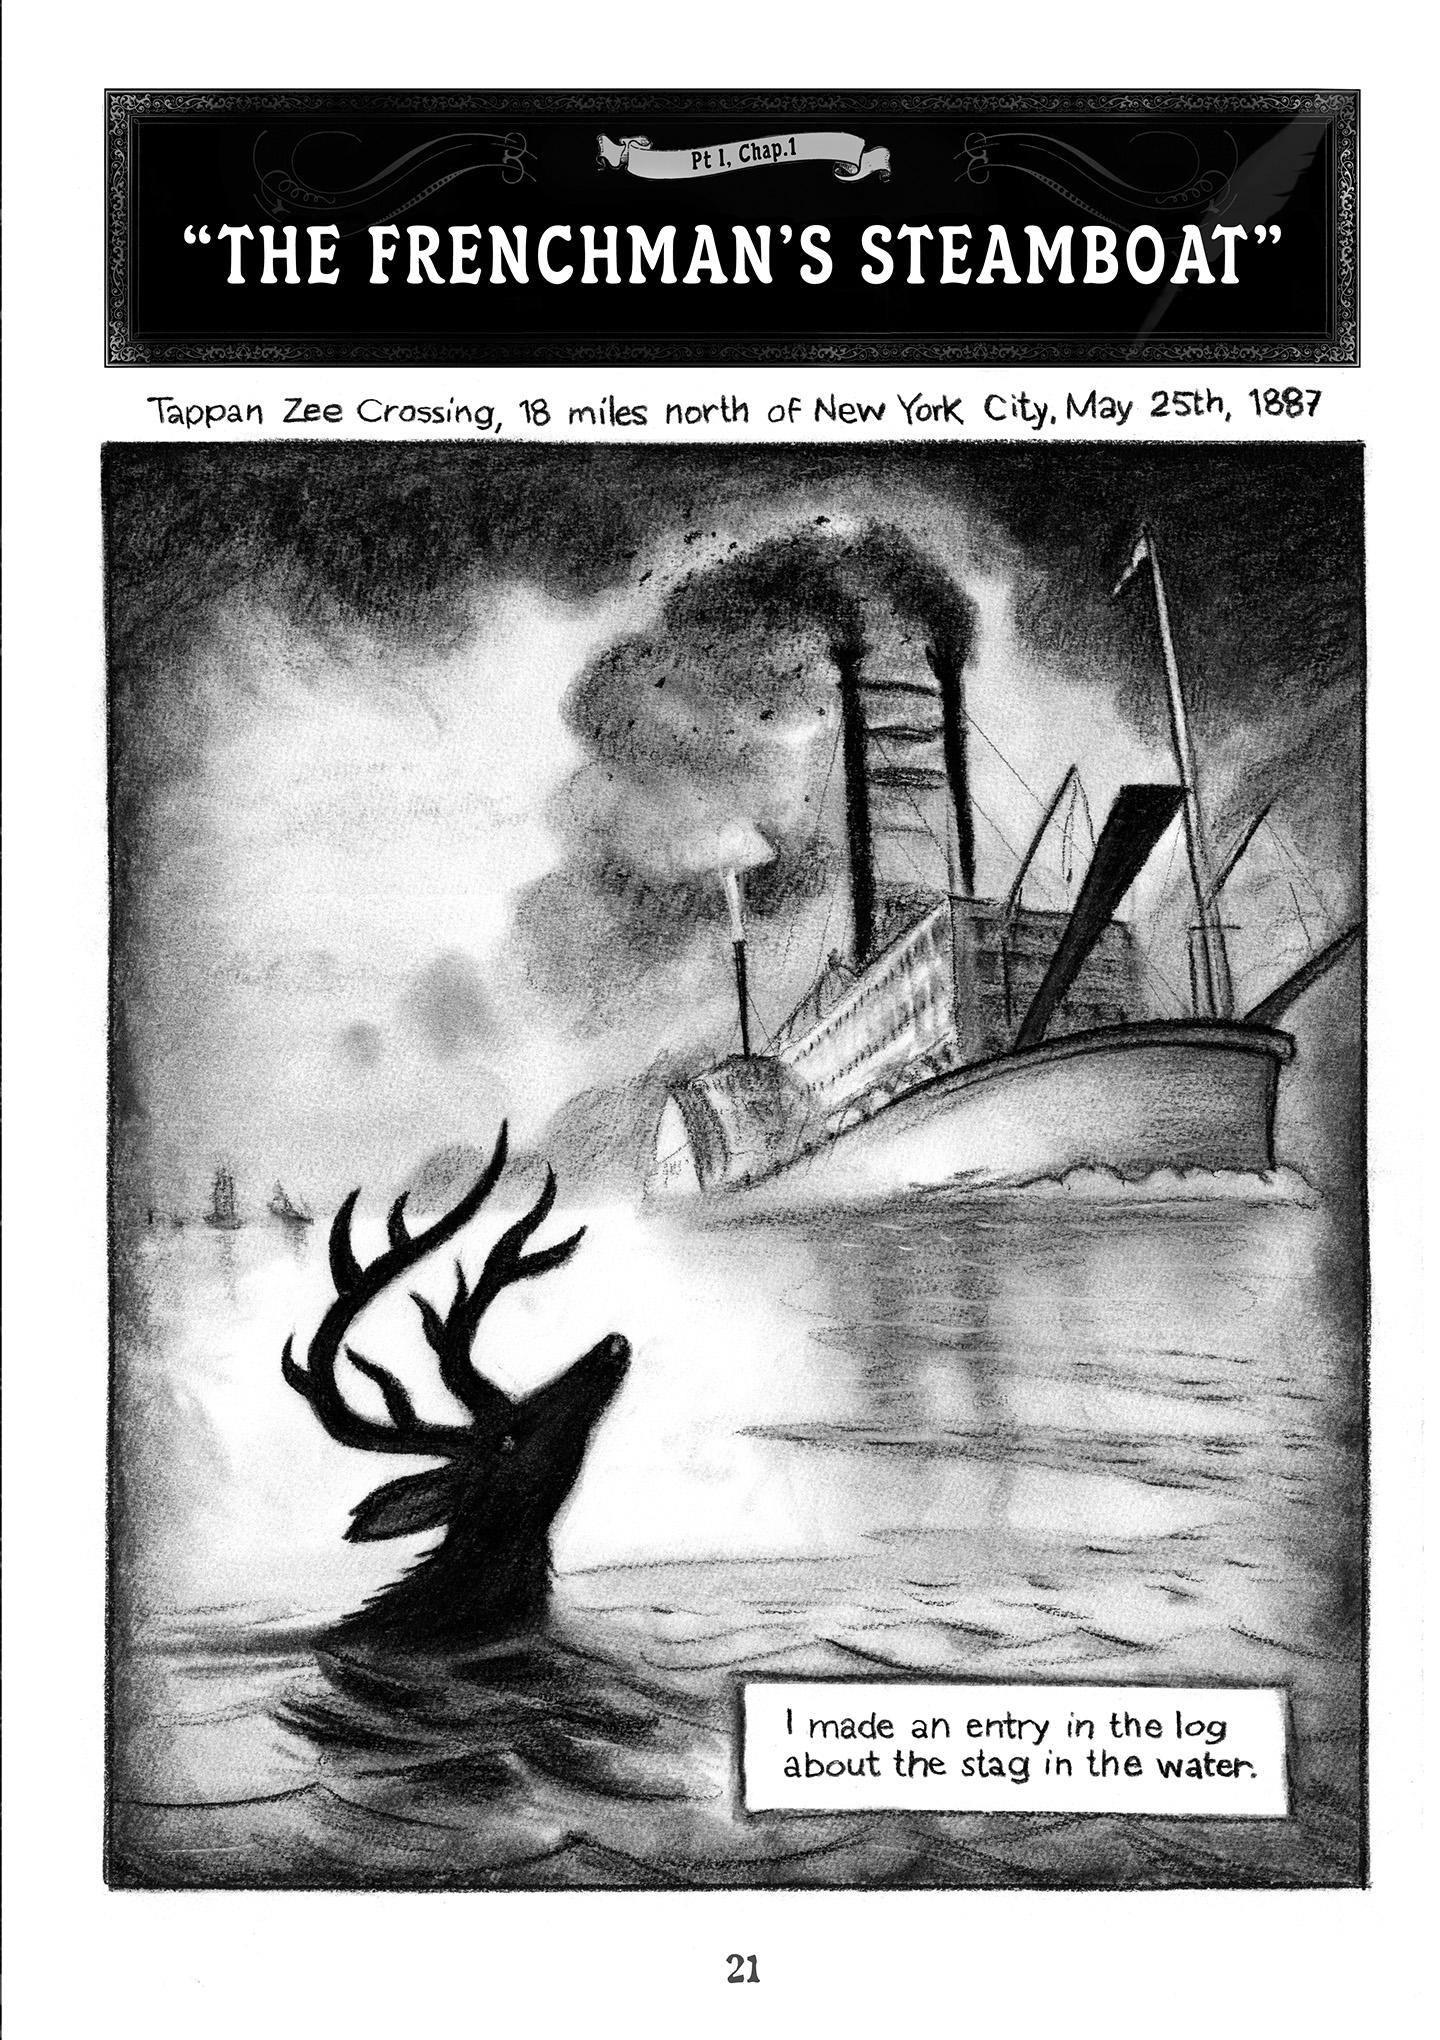 SAILOR TWAIN, or the Mermaid in the Hudson - Mark Siegel